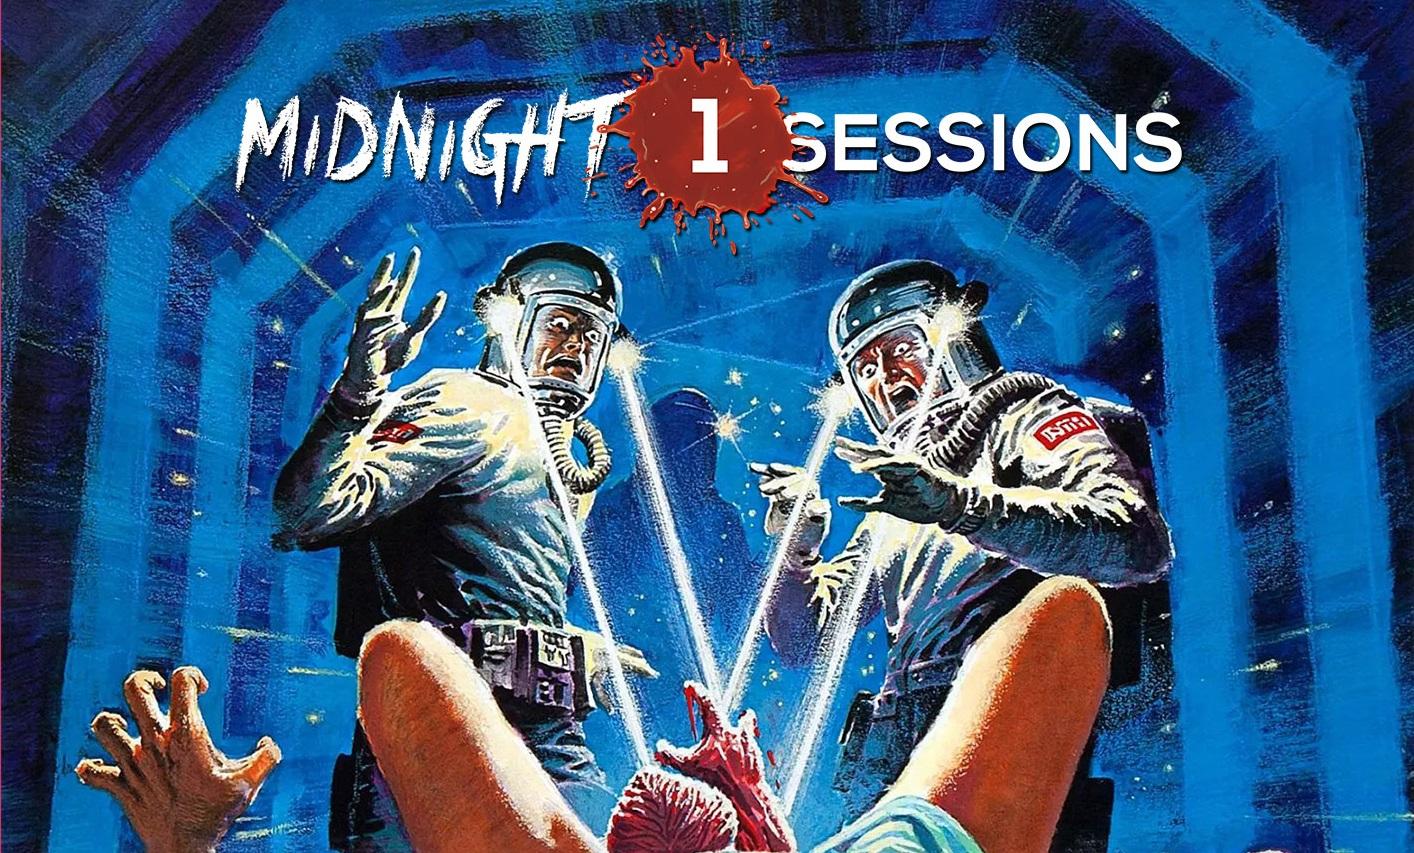 Inseminoid, primer título del sello Midnight Sessions de Reel One Entertainment.